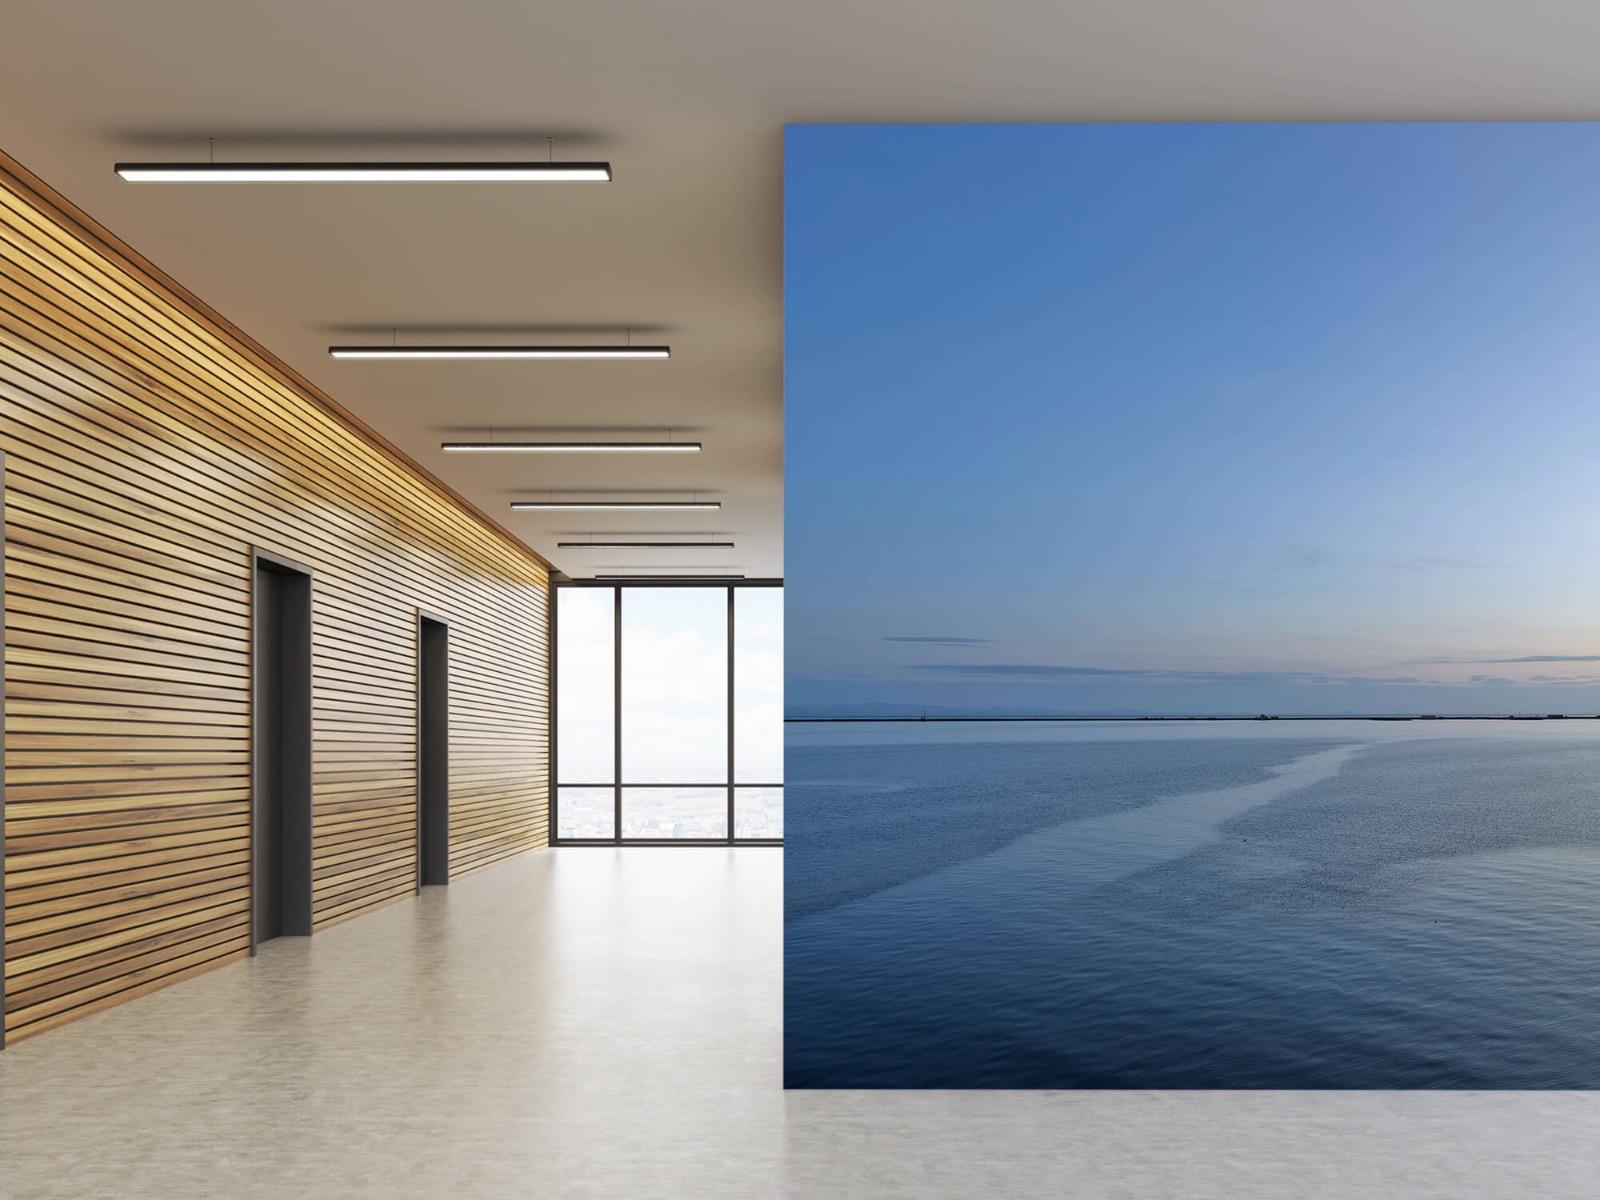 Zeeën en Oceanen - Zee en zonsopkomst - Wallexclusive - Woonkamer 1